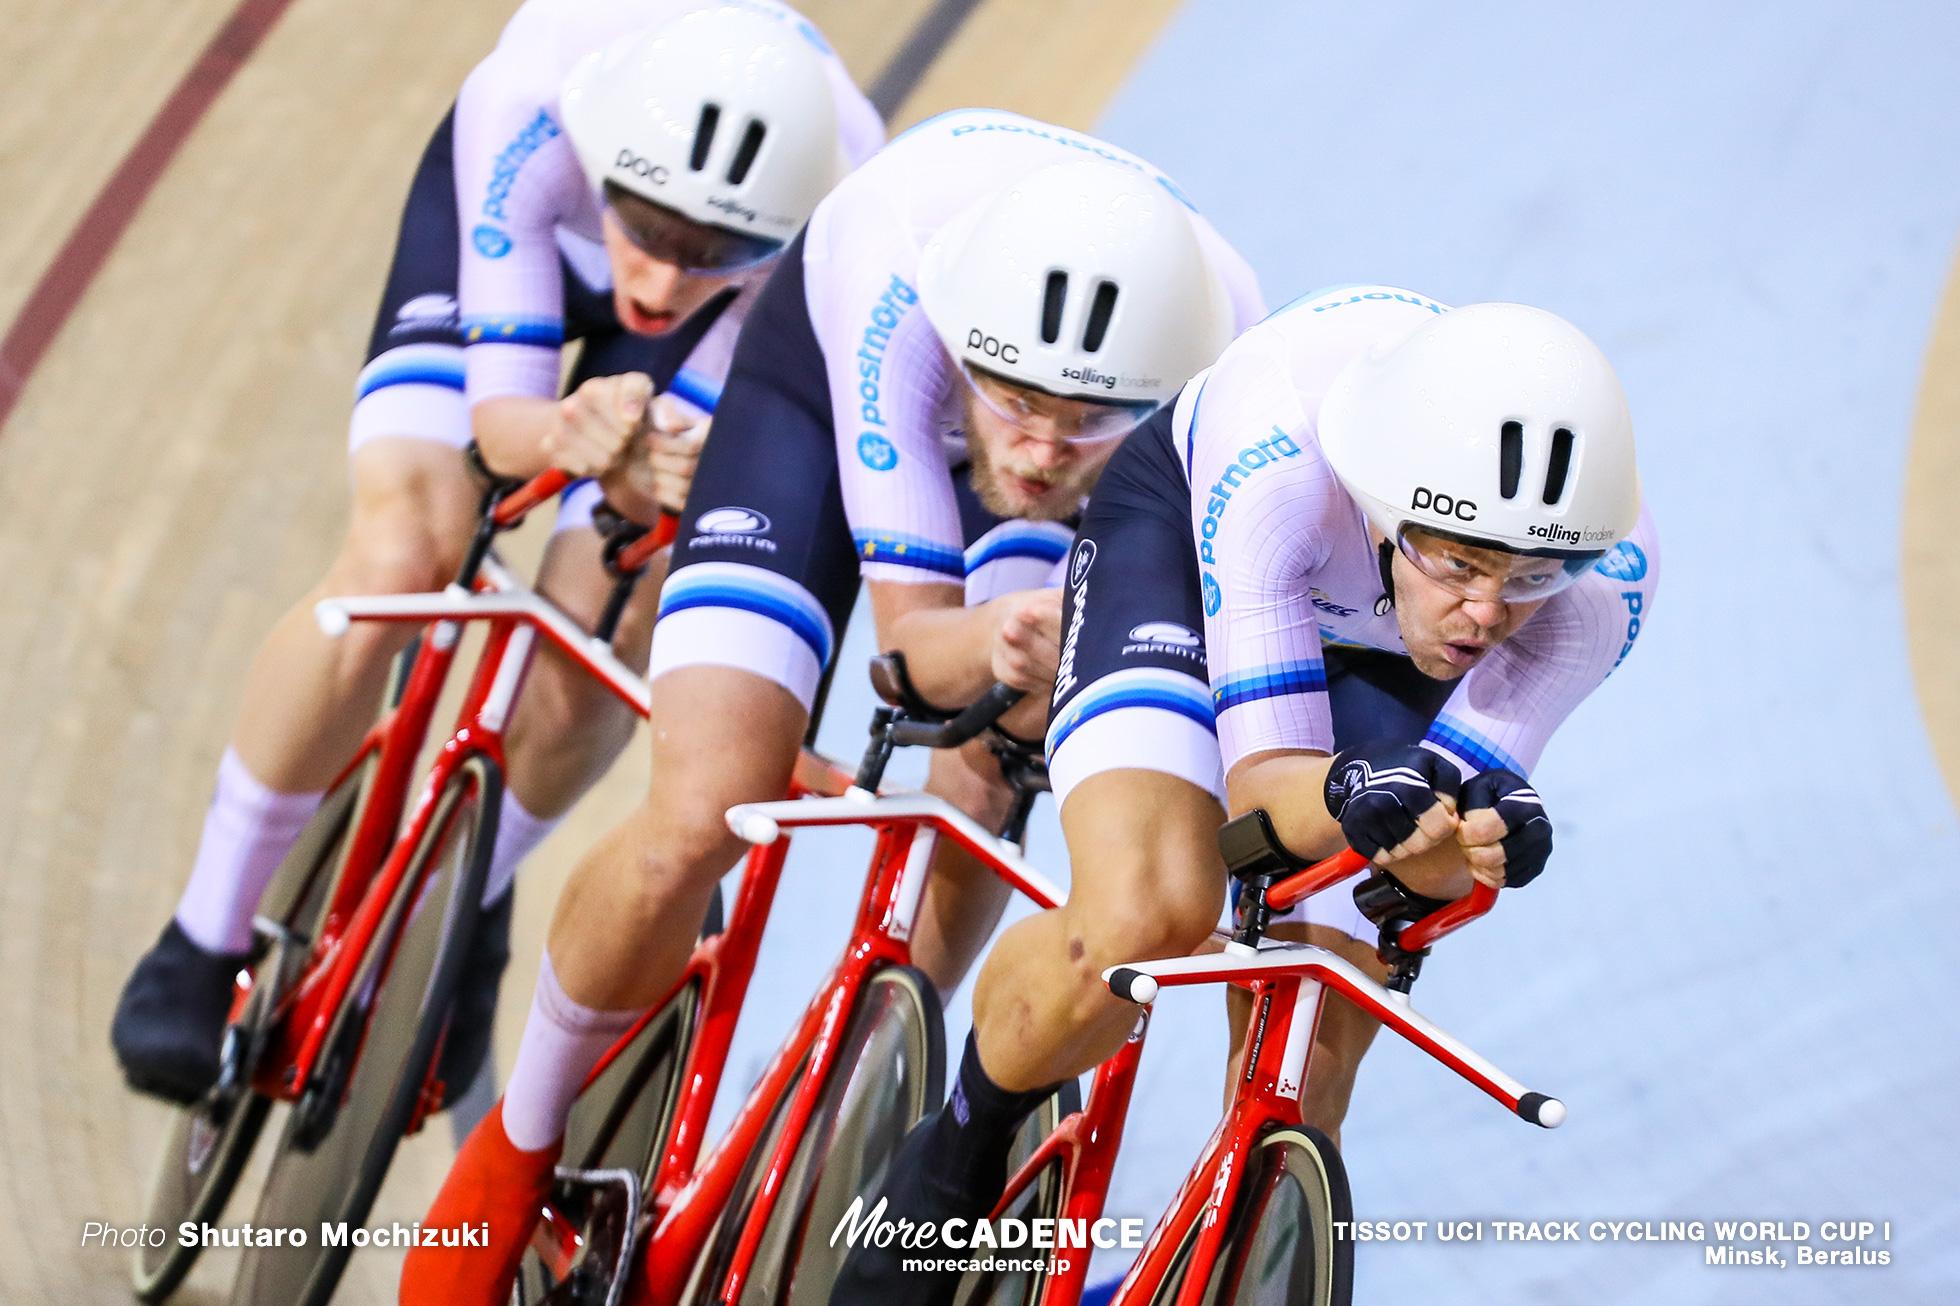 Final / Men's Team Pursuit / TISSOT UCI TRACK CYCLING WORLD CUP I, Minsk, Beralus